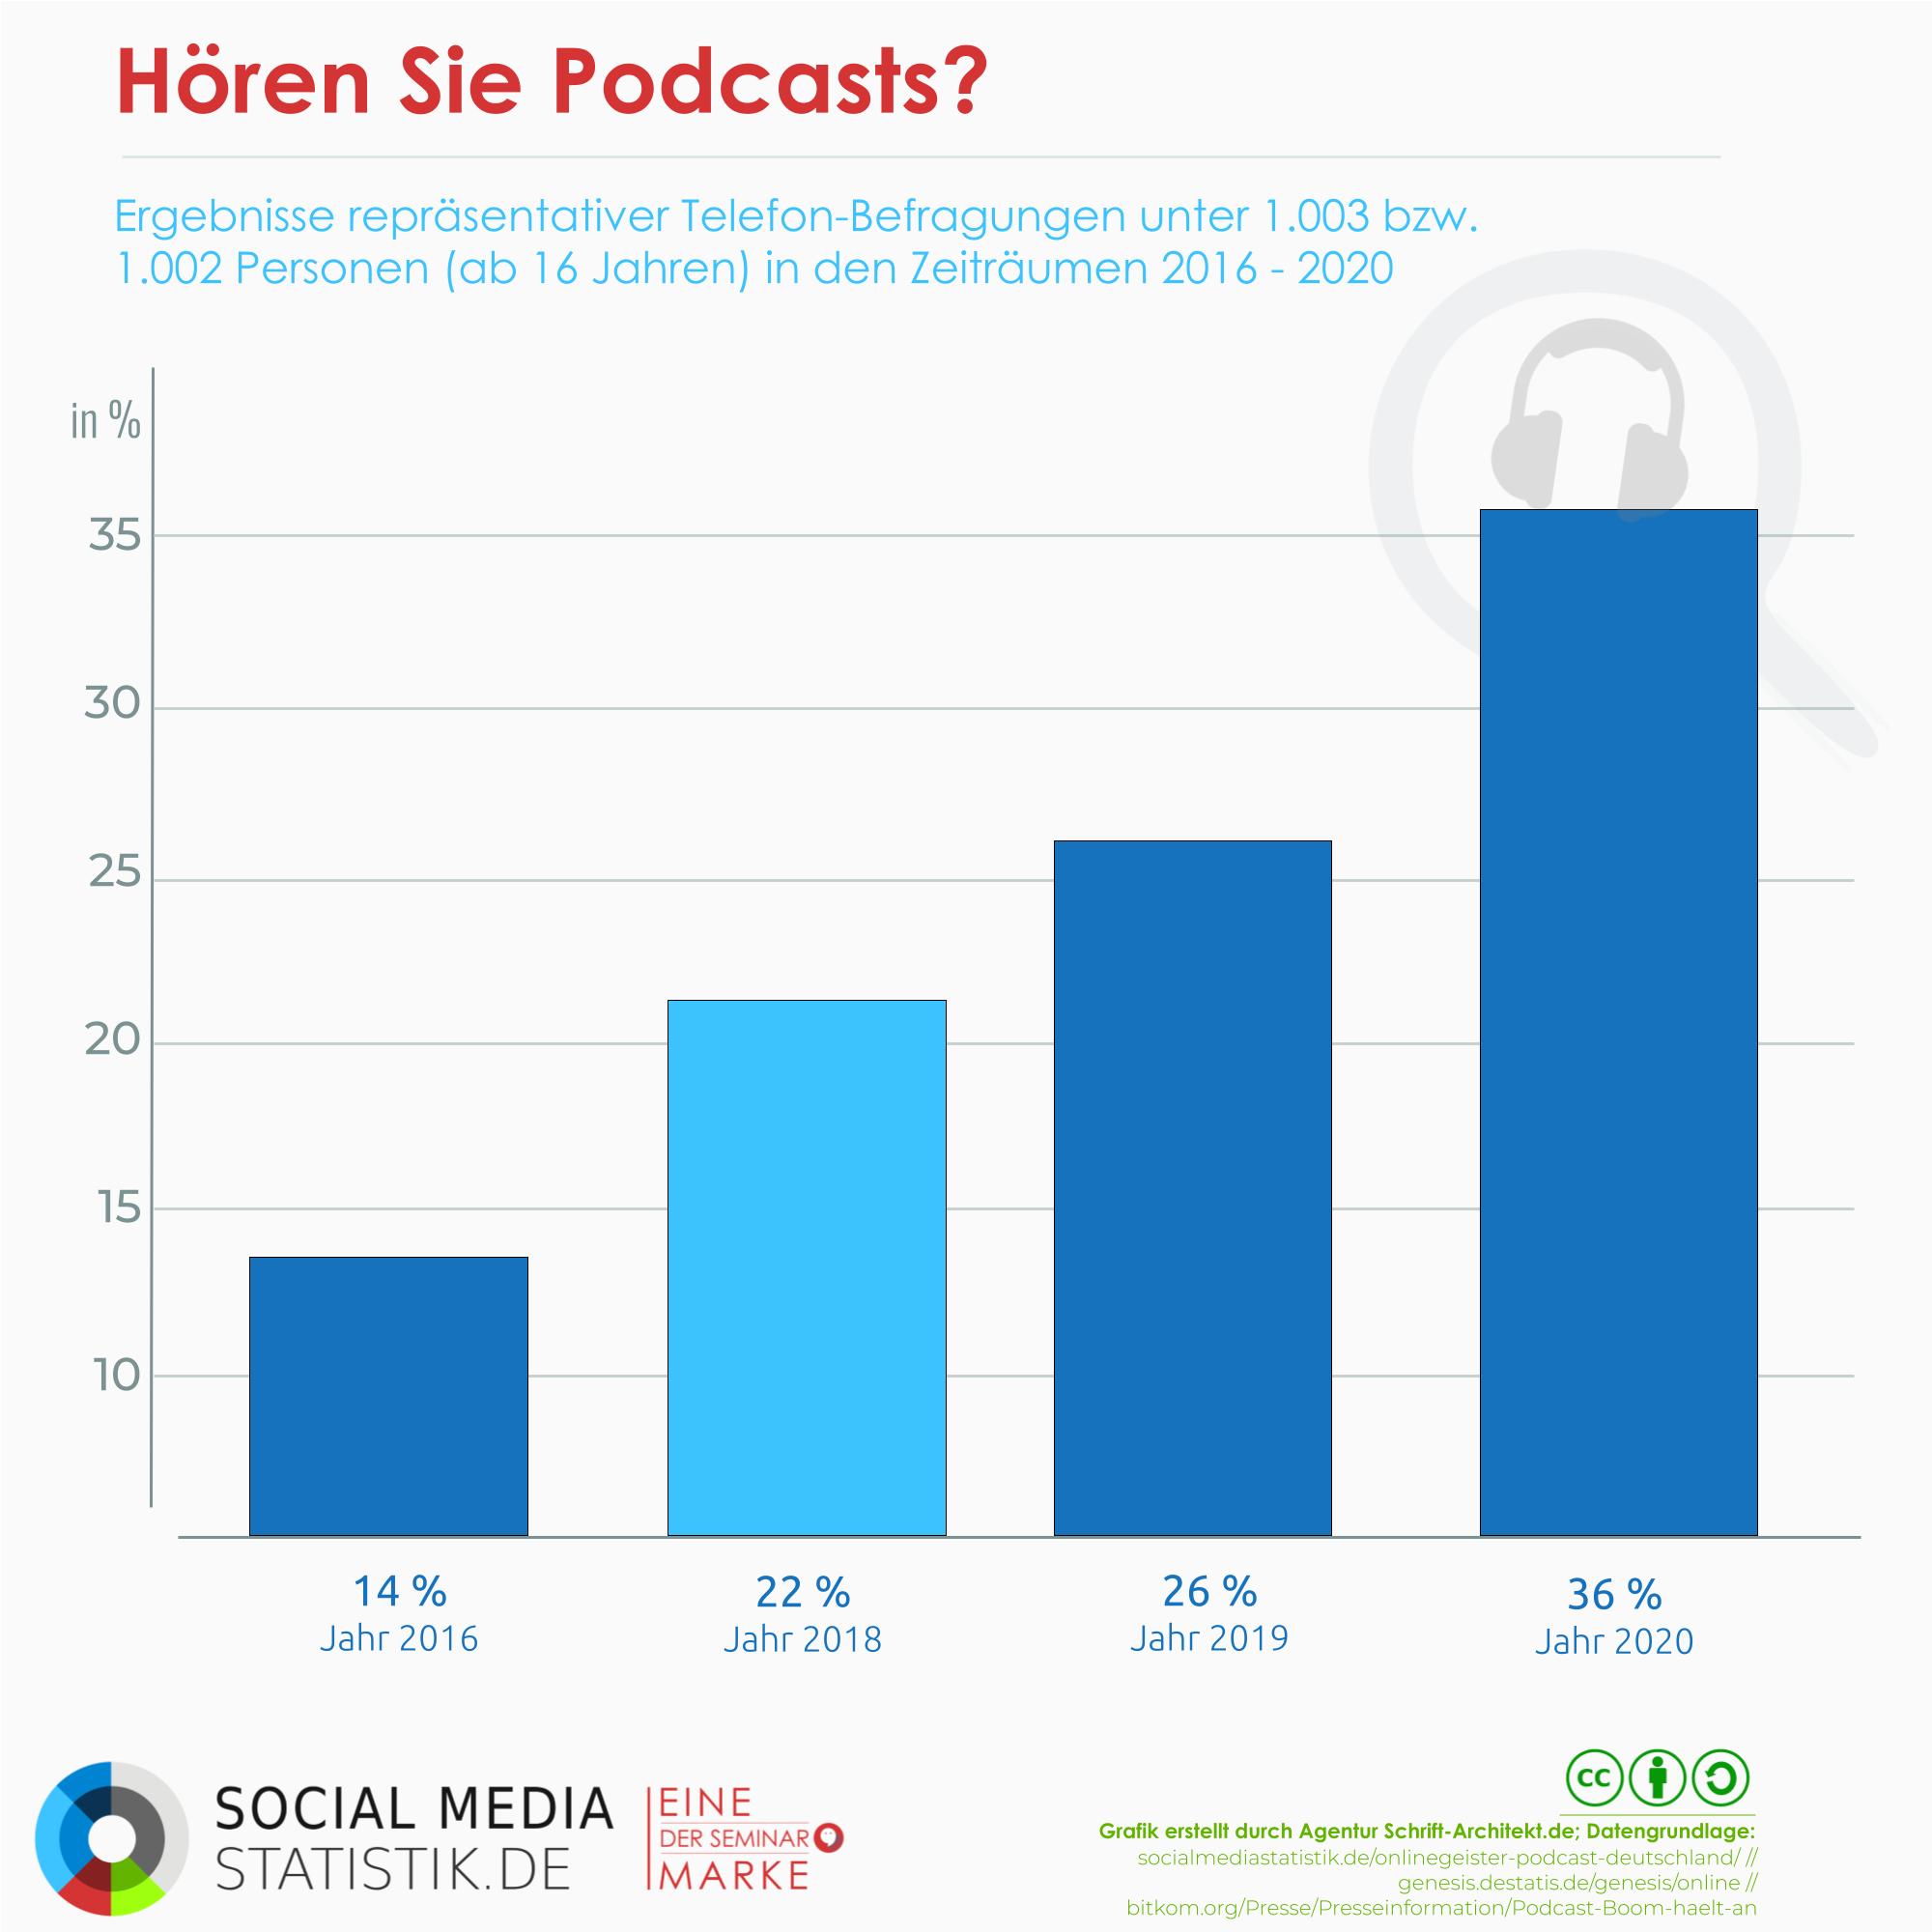 Infografik Social Media Statistik zum Thema wie viele hoeren podcasts